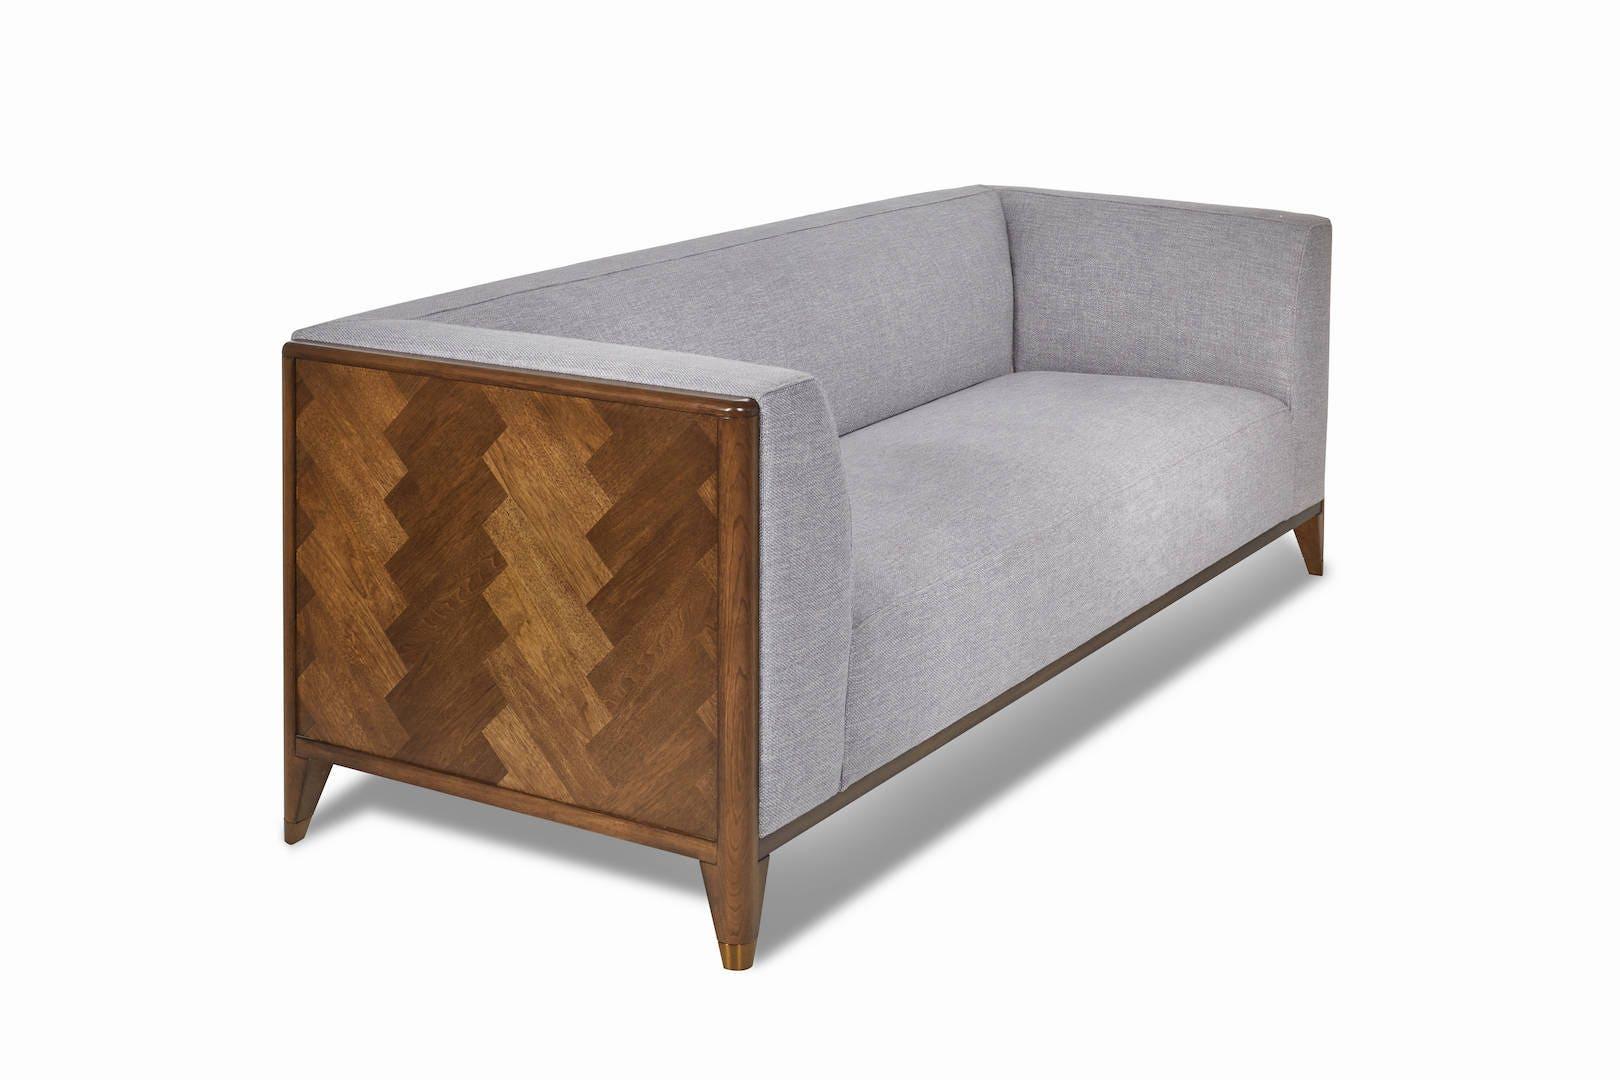 walnut mid century sofa 3 seater wood frame sofa mid century sofa bella collection ekais - Wood Frame Sofa